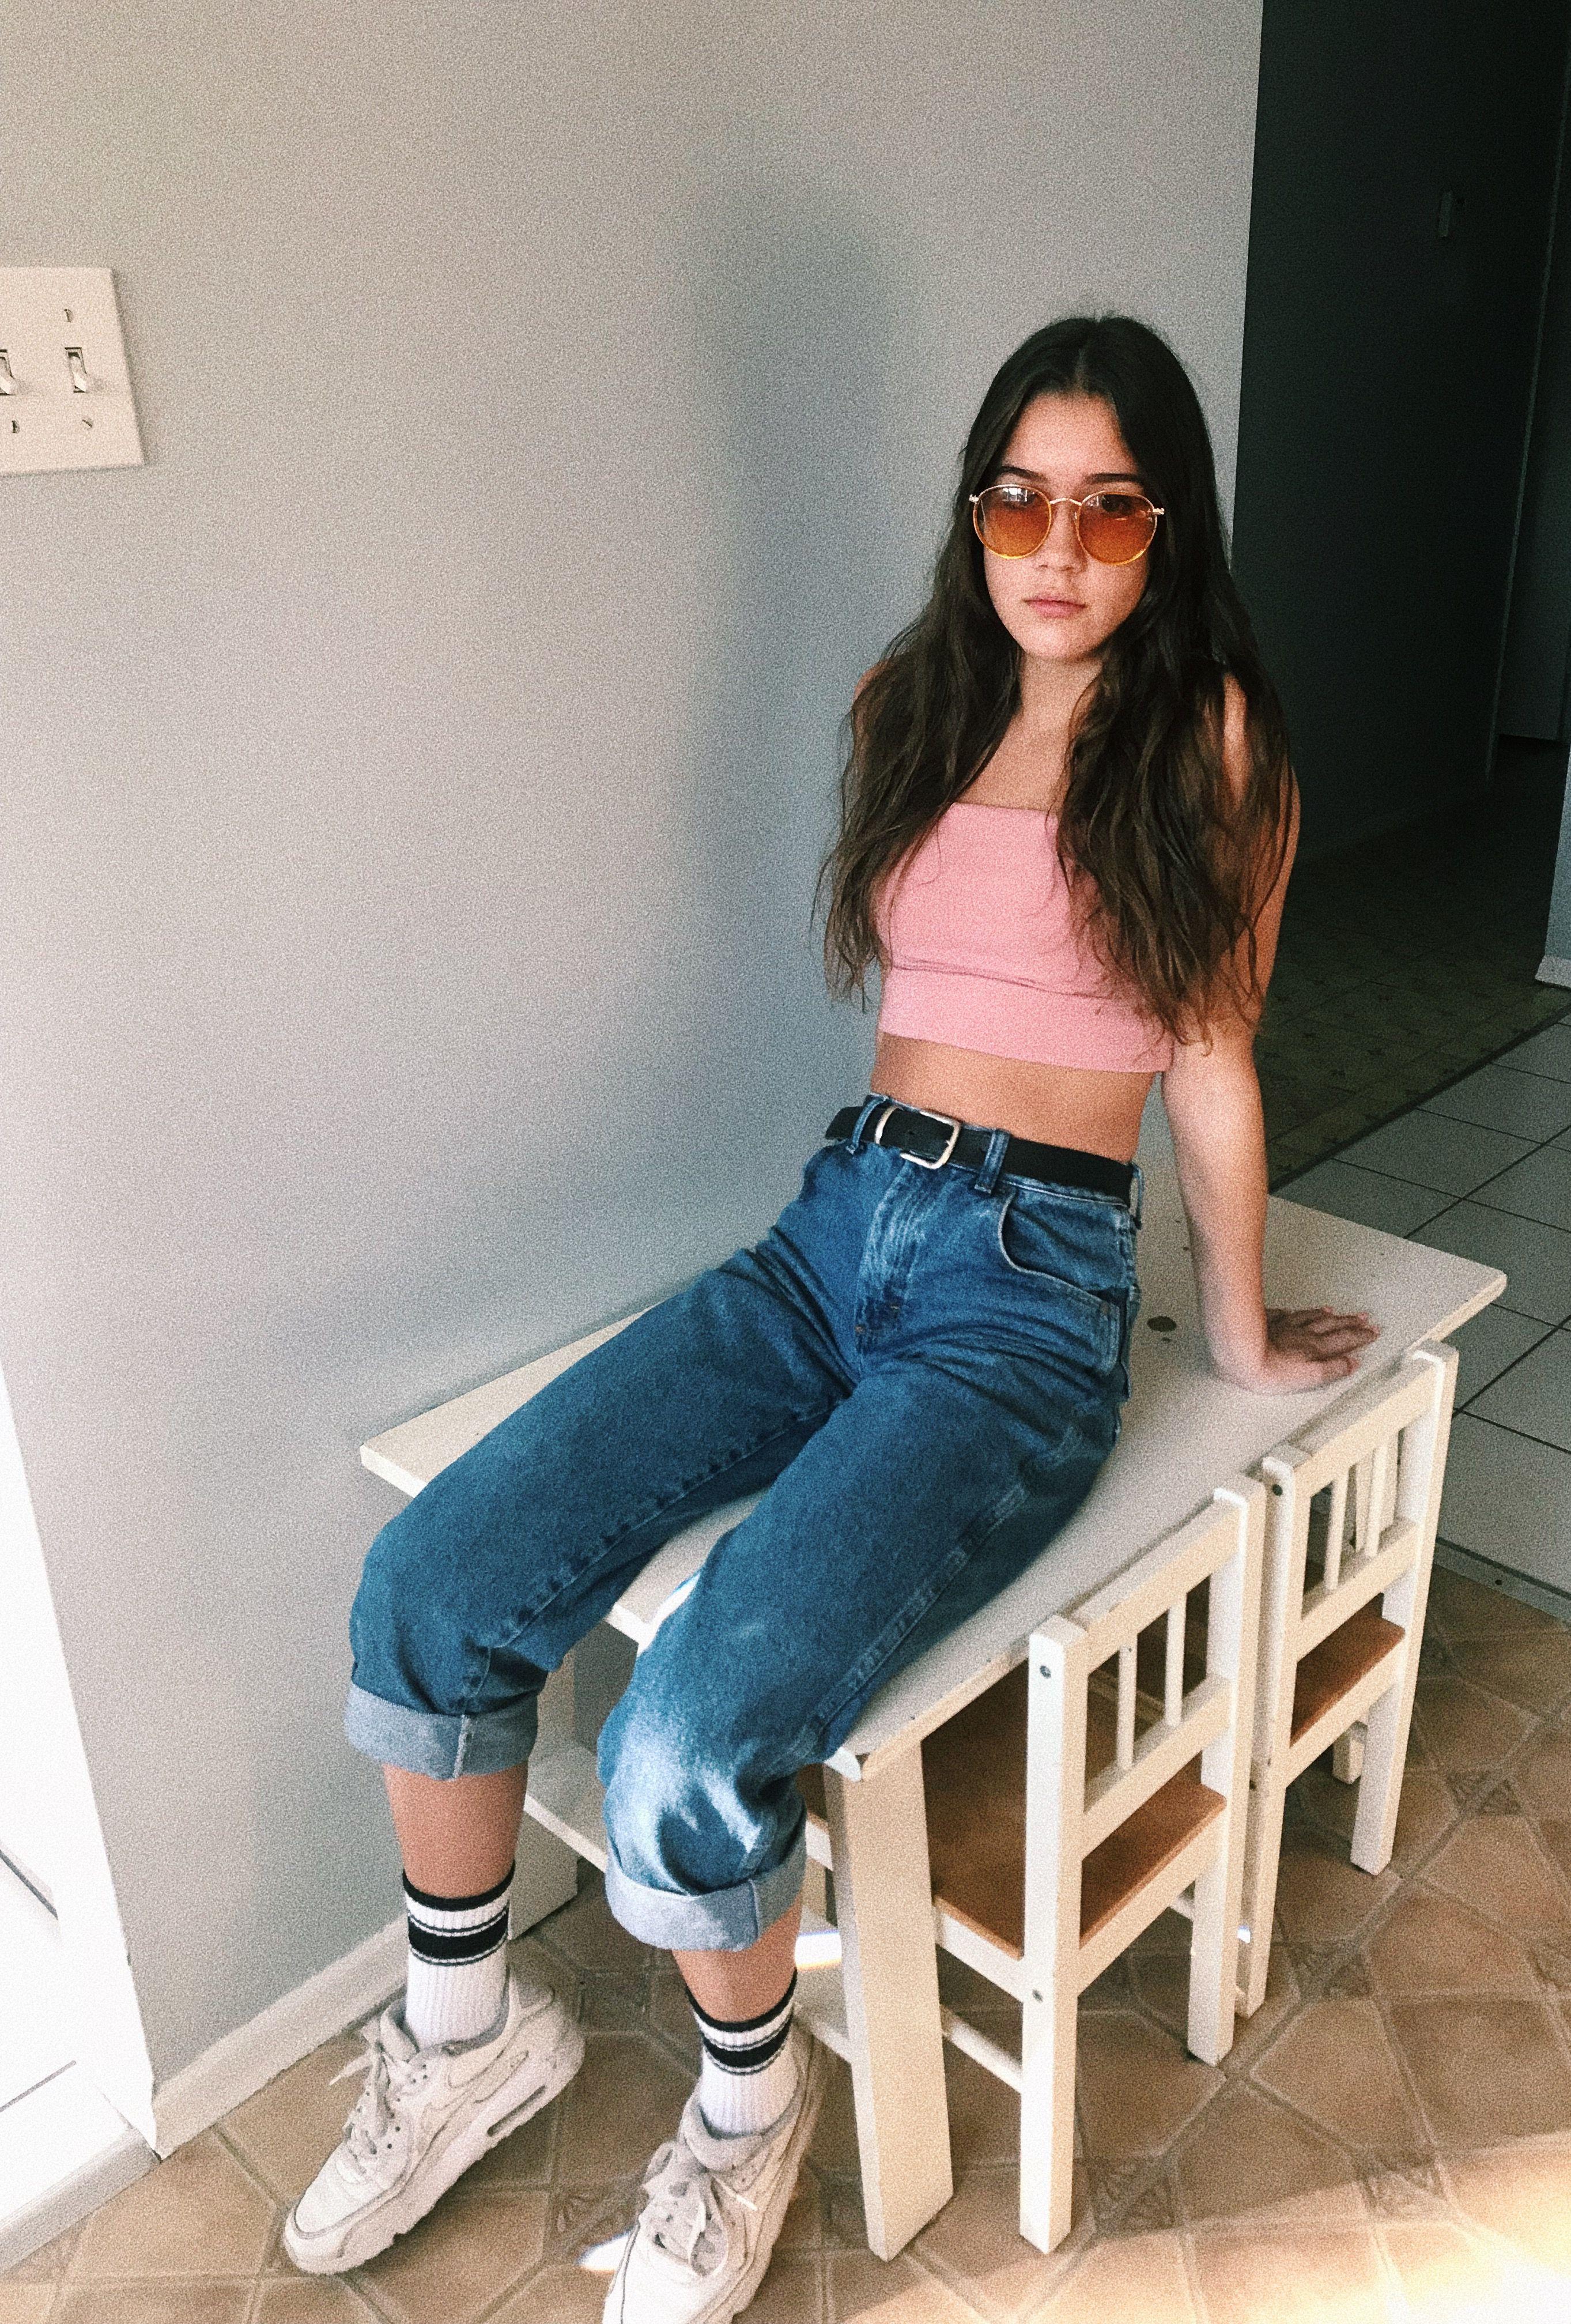 Pin De Desiree Mendoza Em Fashion Able Looks Looks Casuais Looks Cool